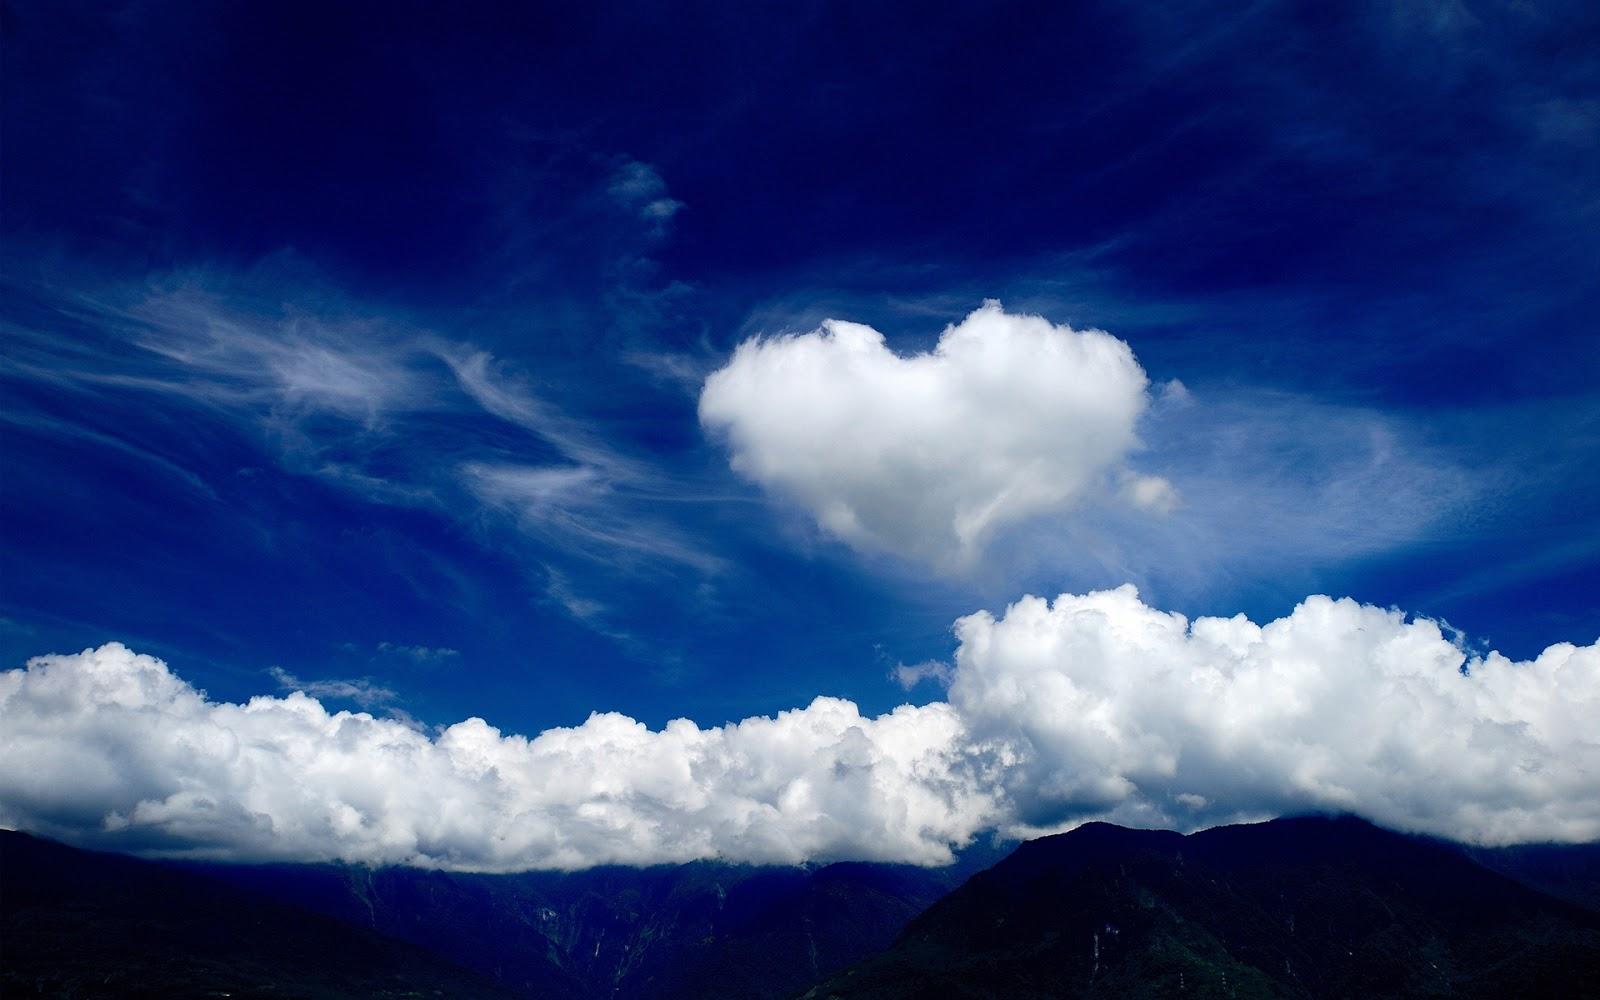 Heart Shaped Cloud Wallpapers